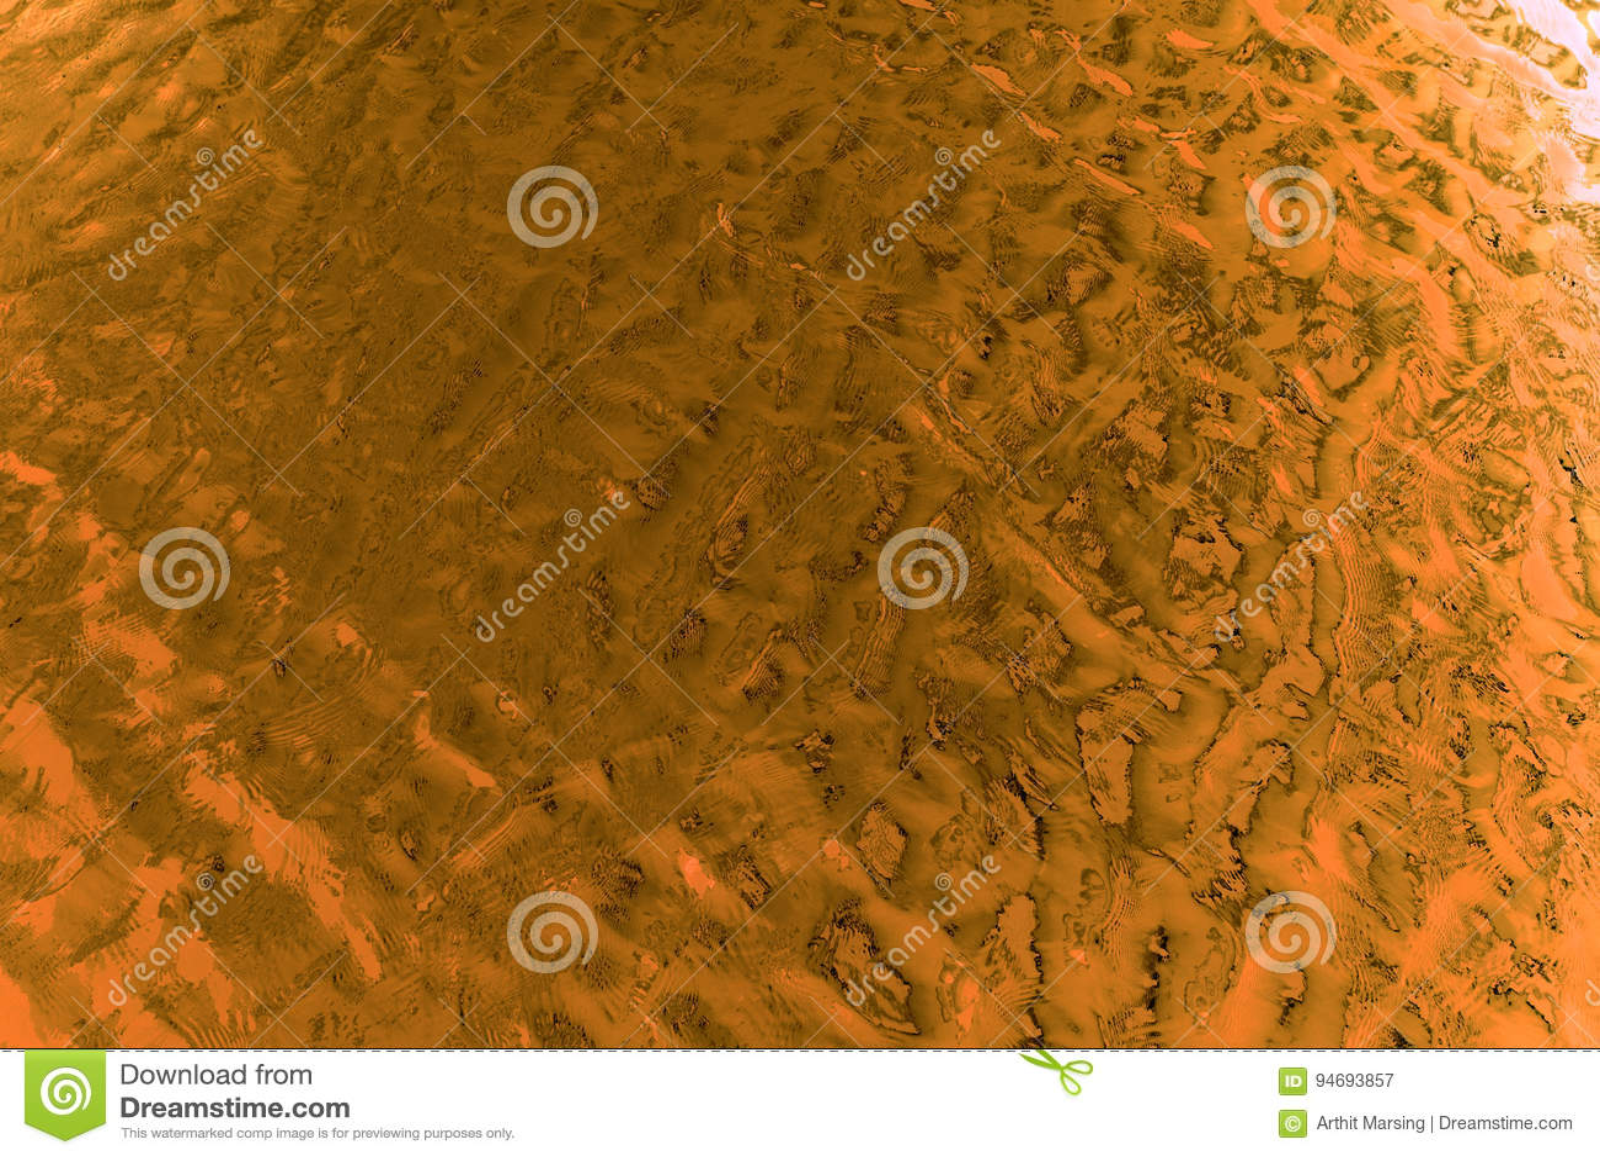 Golden abstract texture grain background.